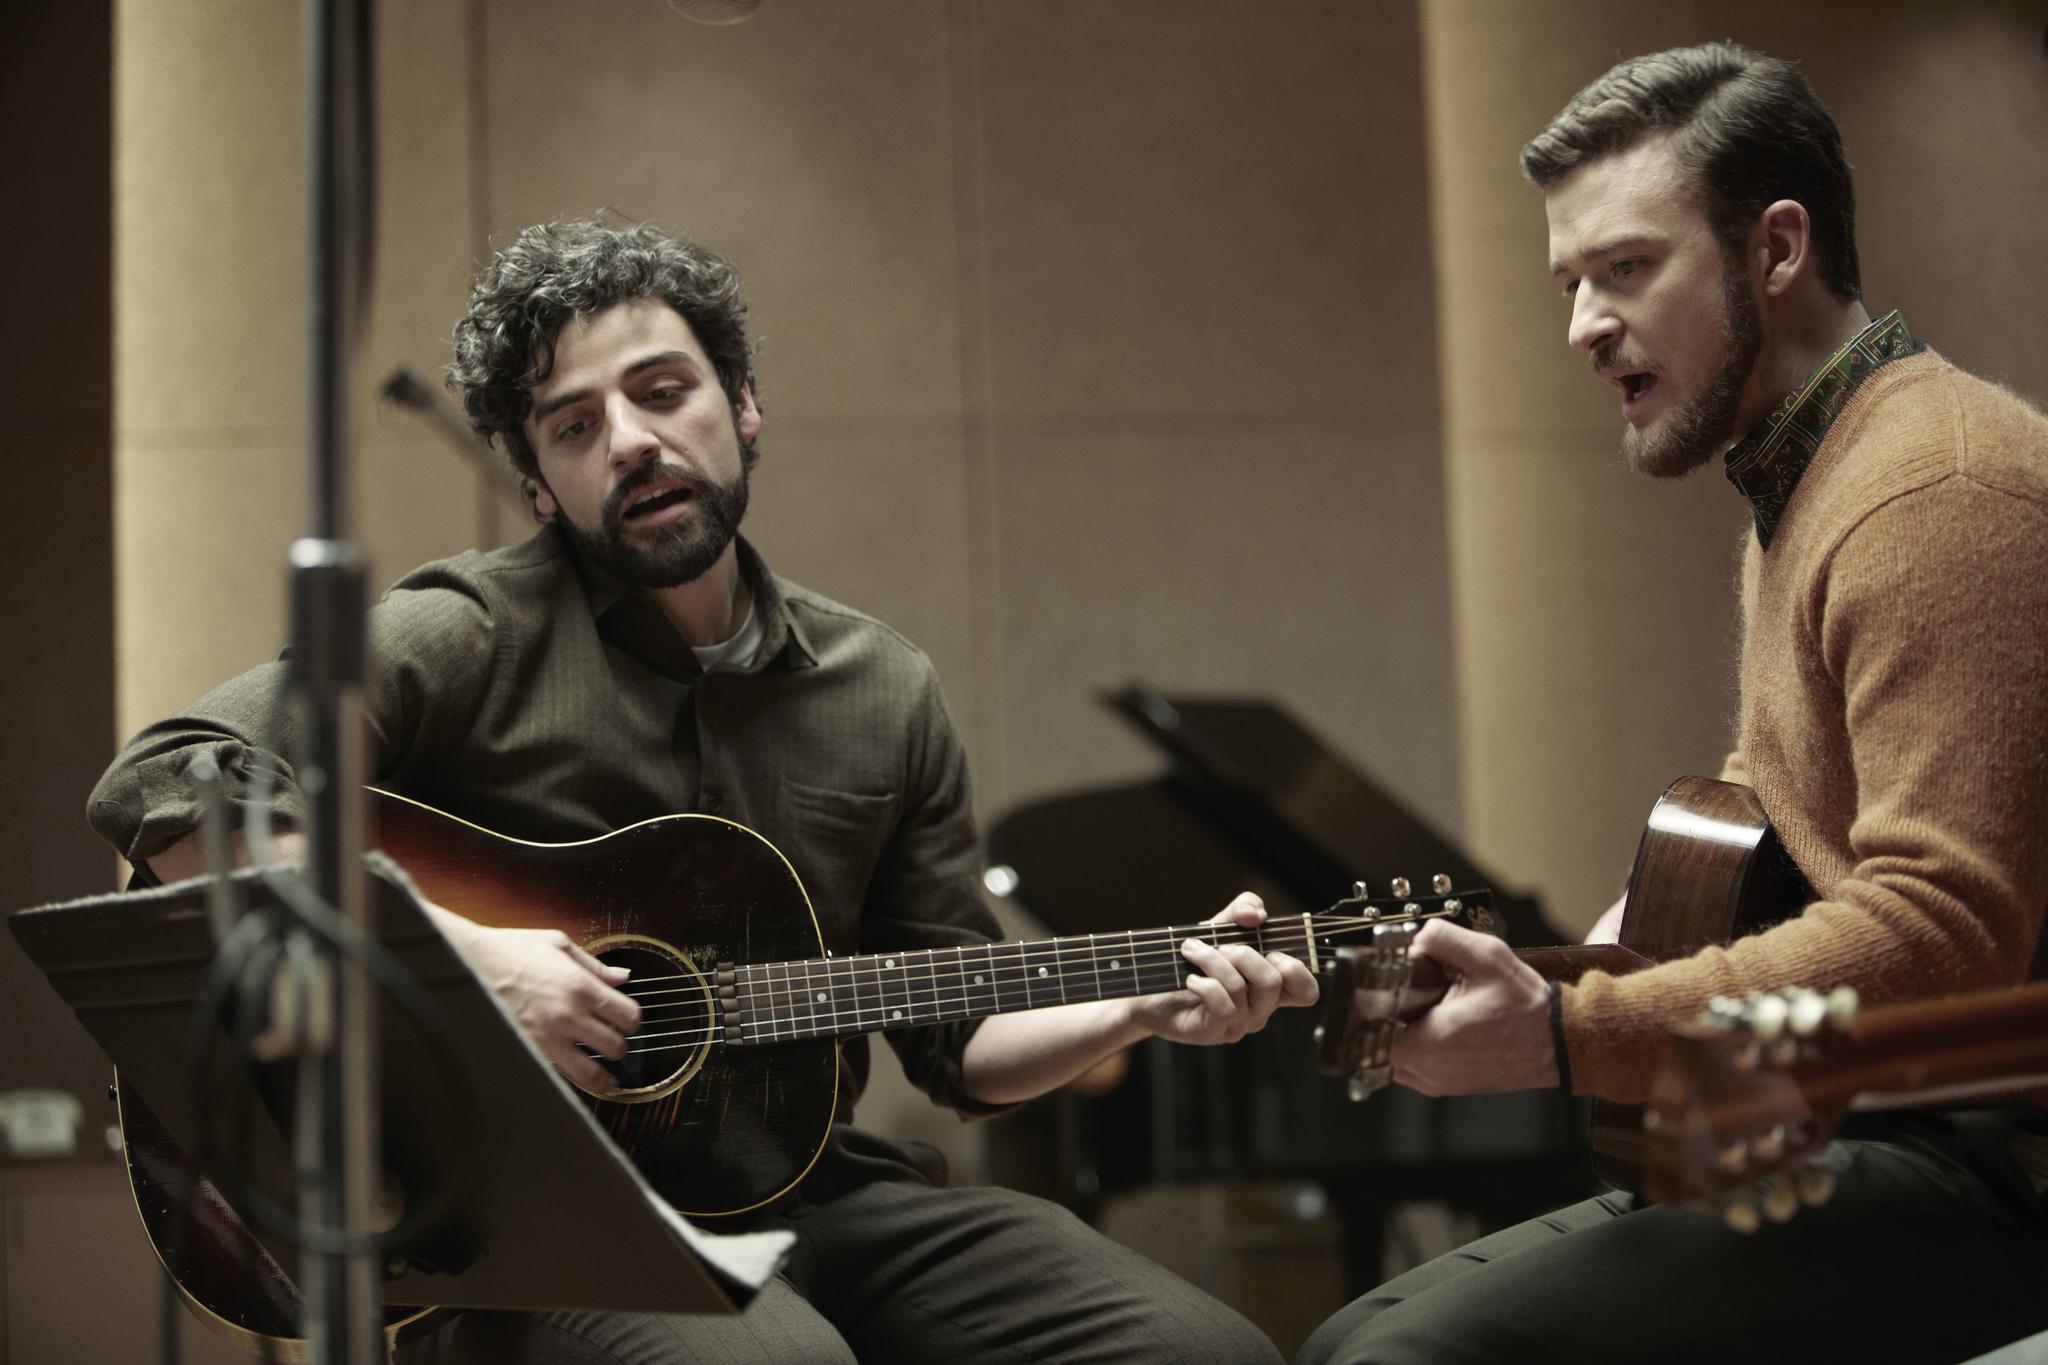 Oscar-Isaac-and-Justin-Timberlake-in-Inside-Llewyn-Davis